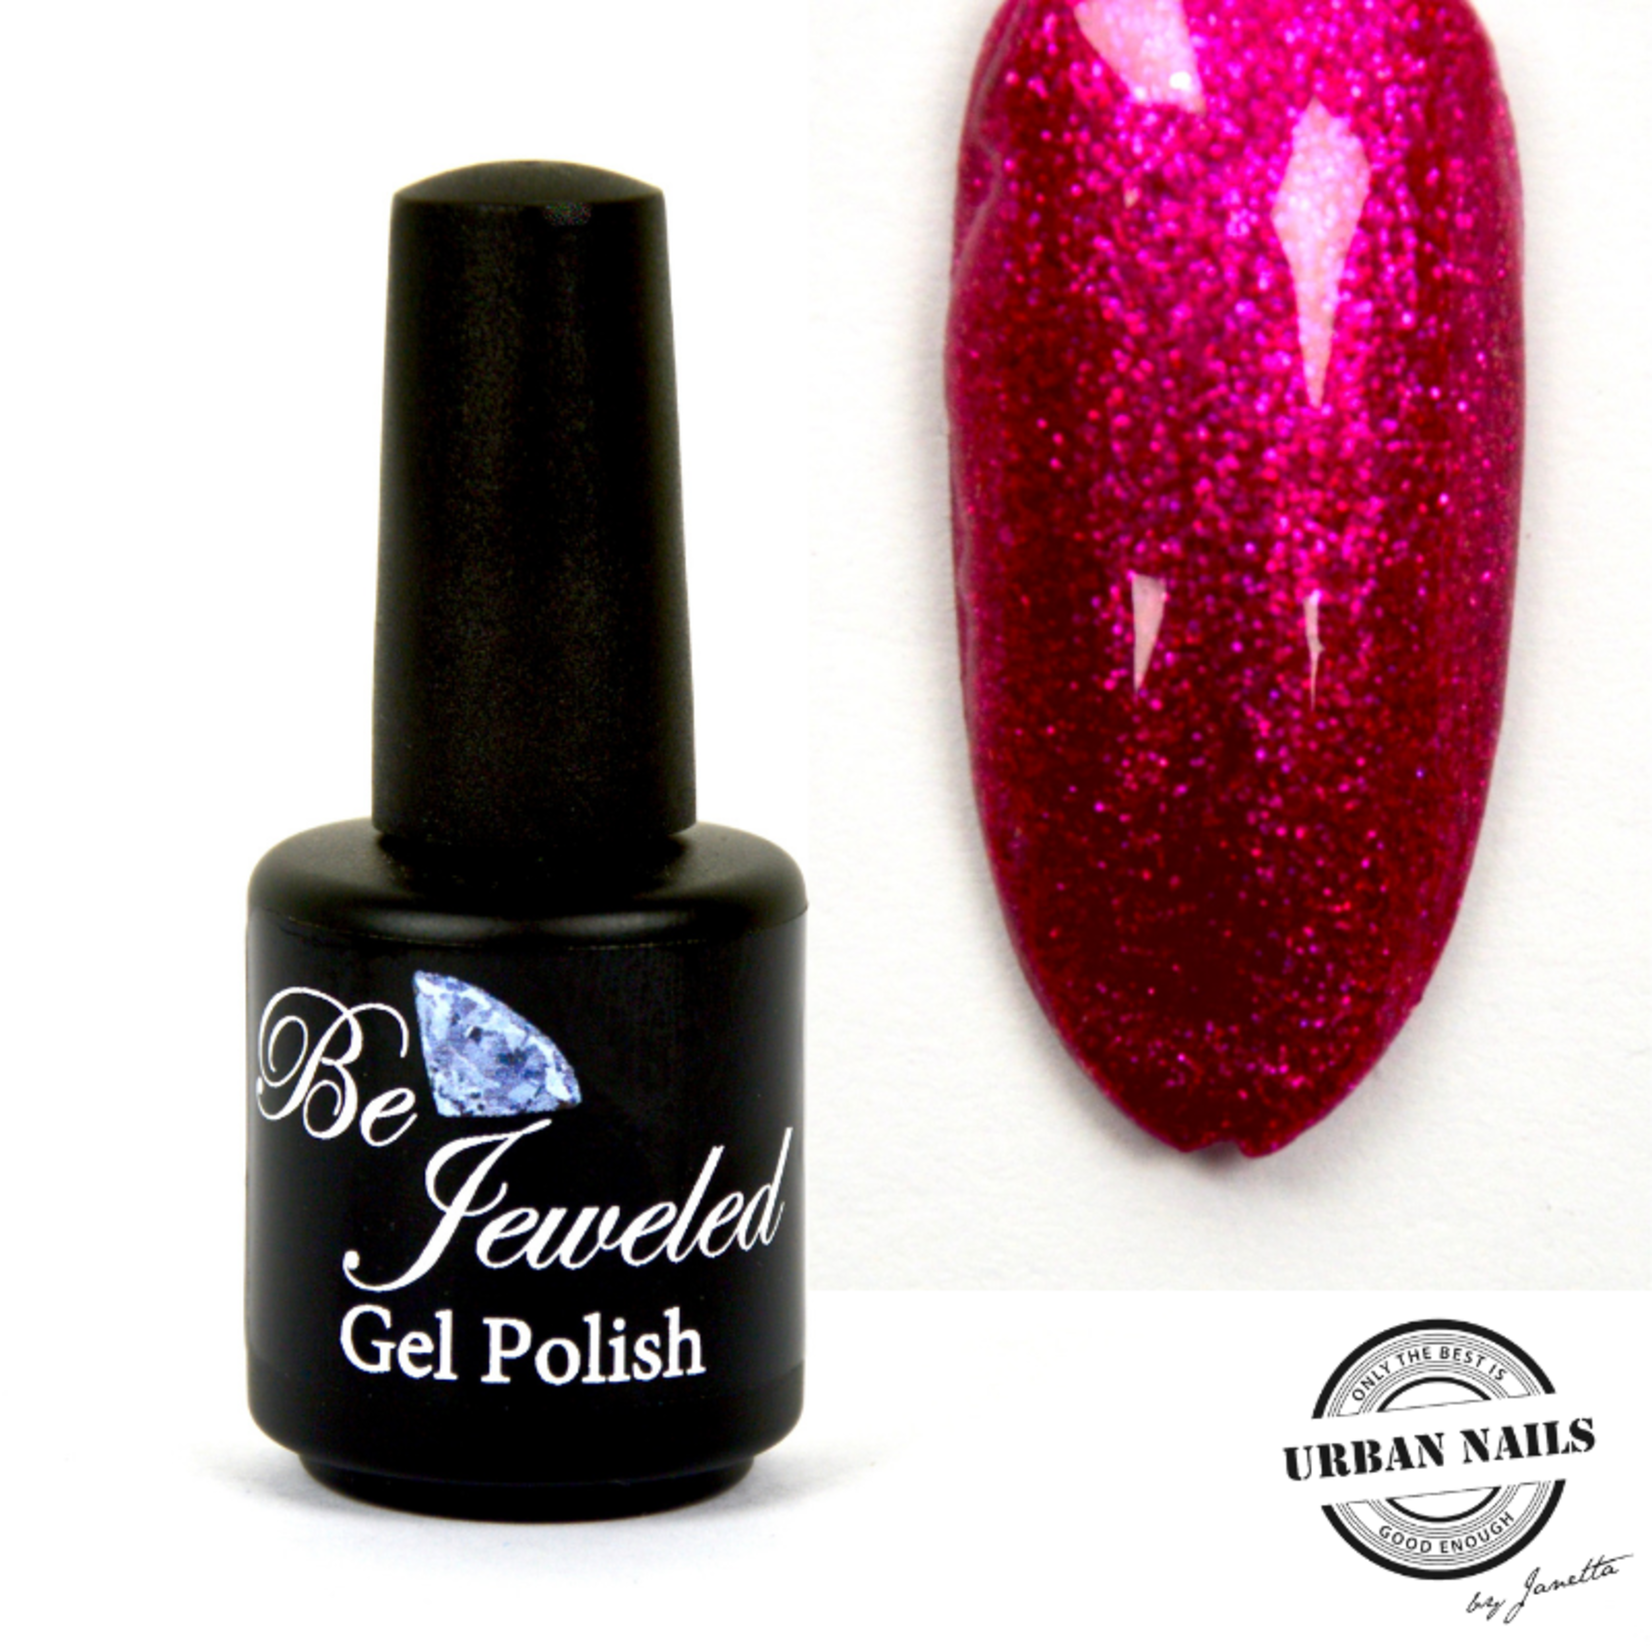 Urban Nails Be Jeweled Gelpolish 141 Donker Rood Roze Glitter